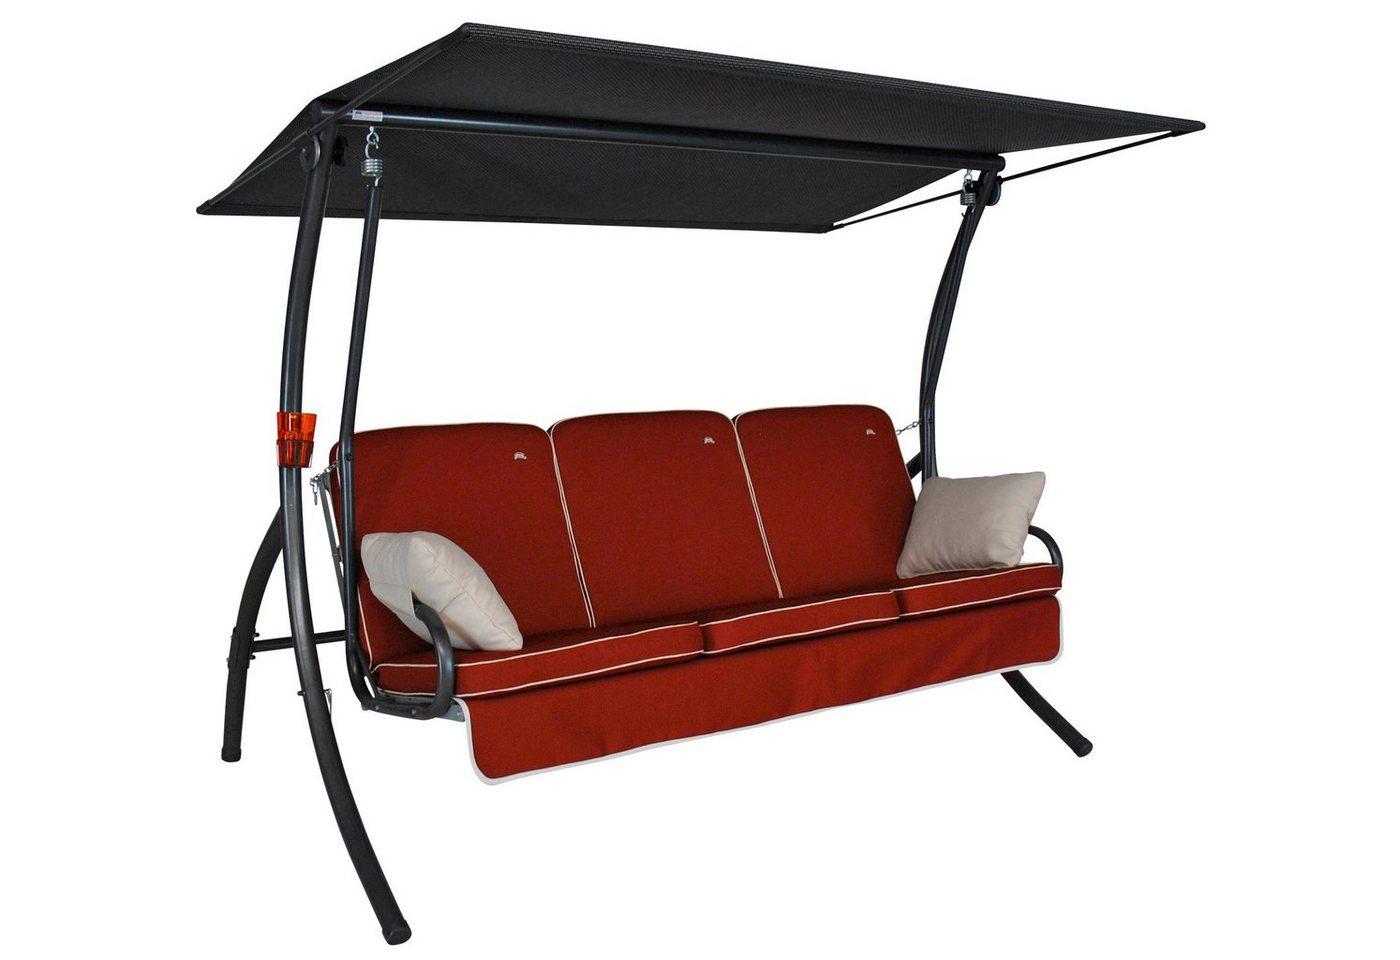 Hollywoodschaukel Metall 3-Sitzer Primero Style*